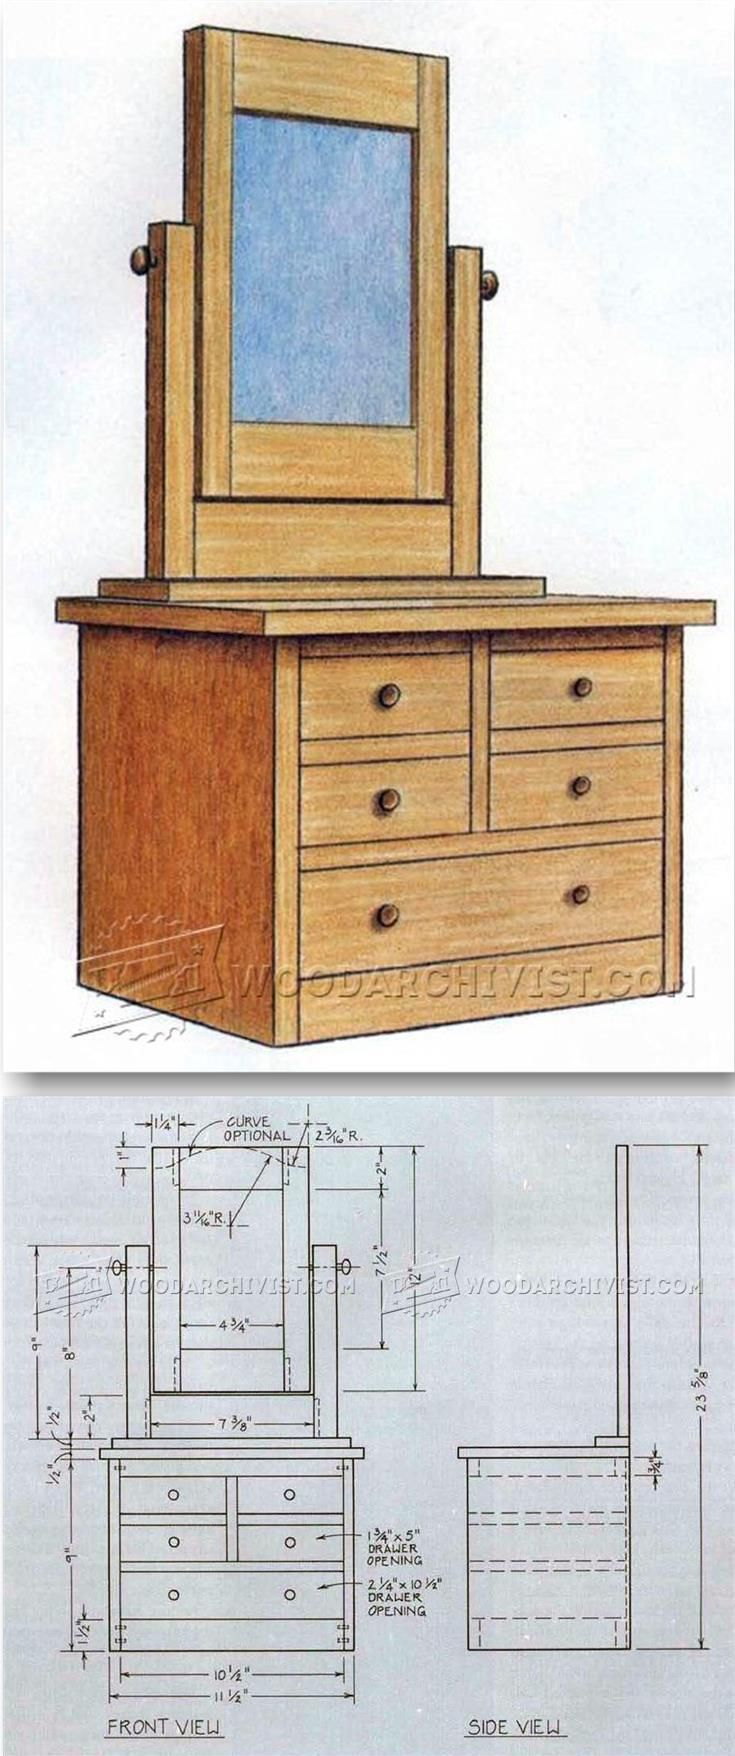 Vanity Dresser Plans - Furniture Plans and Projects   WoodArchivist.com